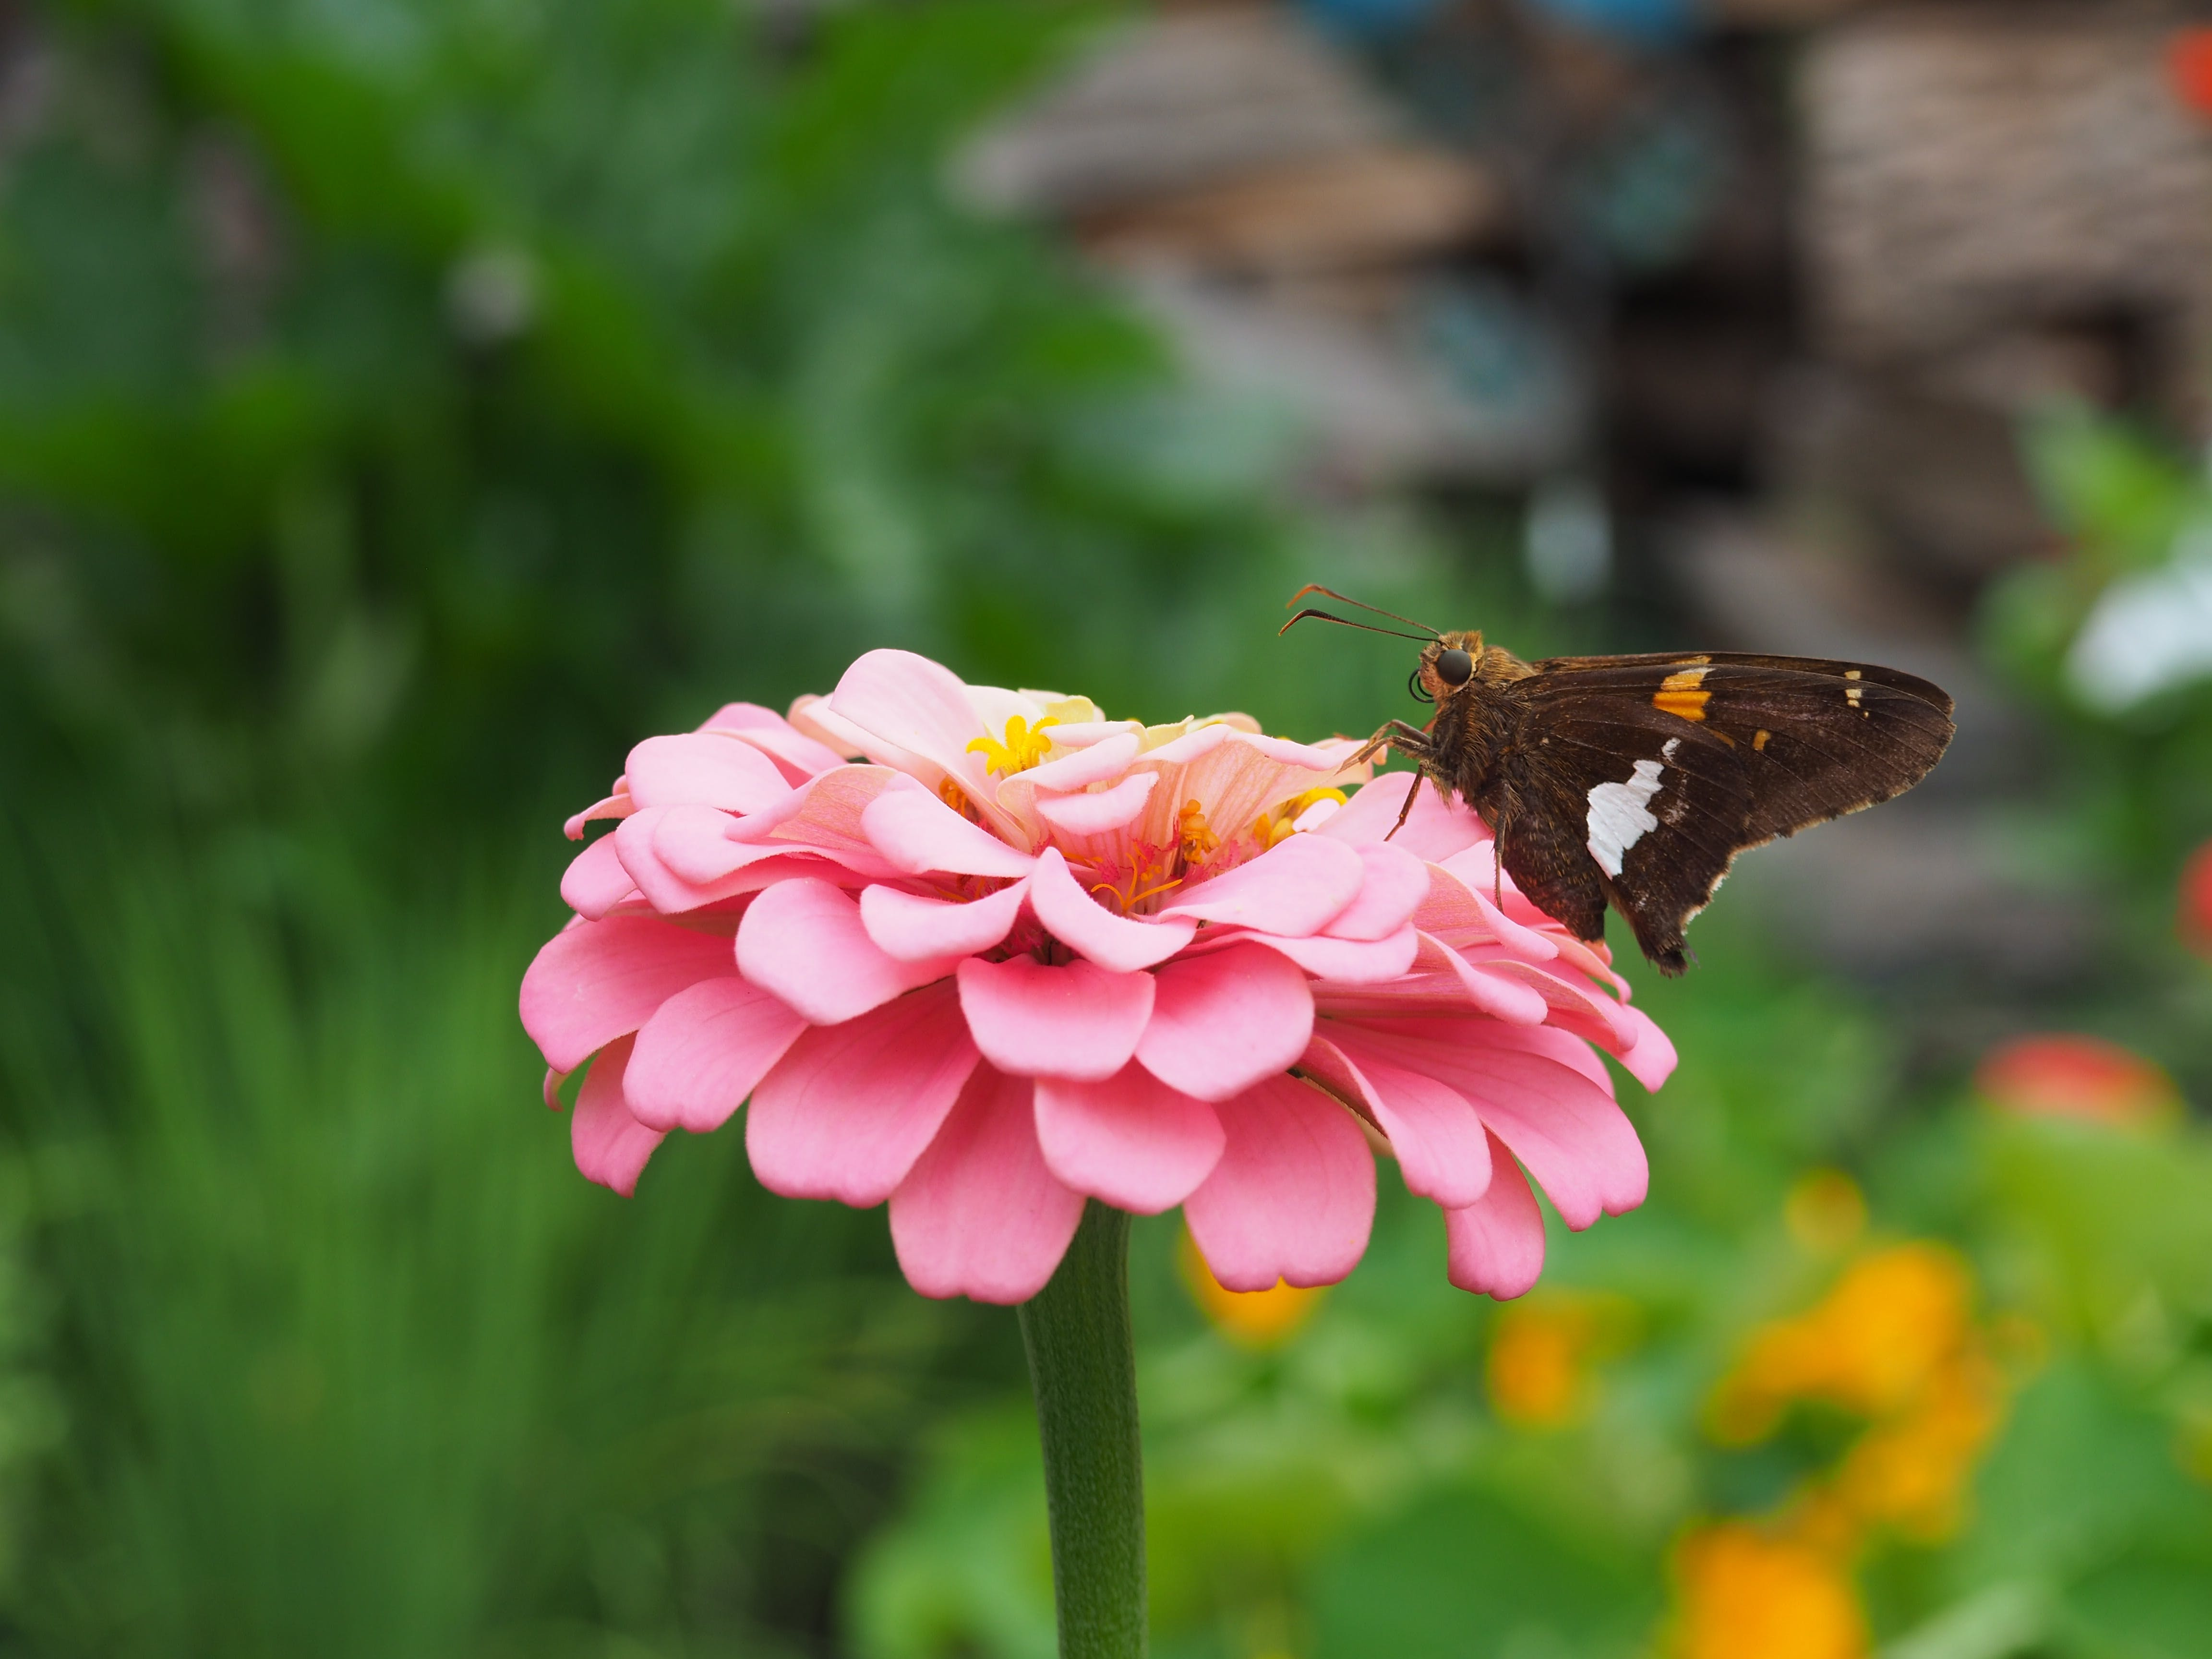 Free stock photo of beautiful flowers, butterfly, butterfly on a flower, flower